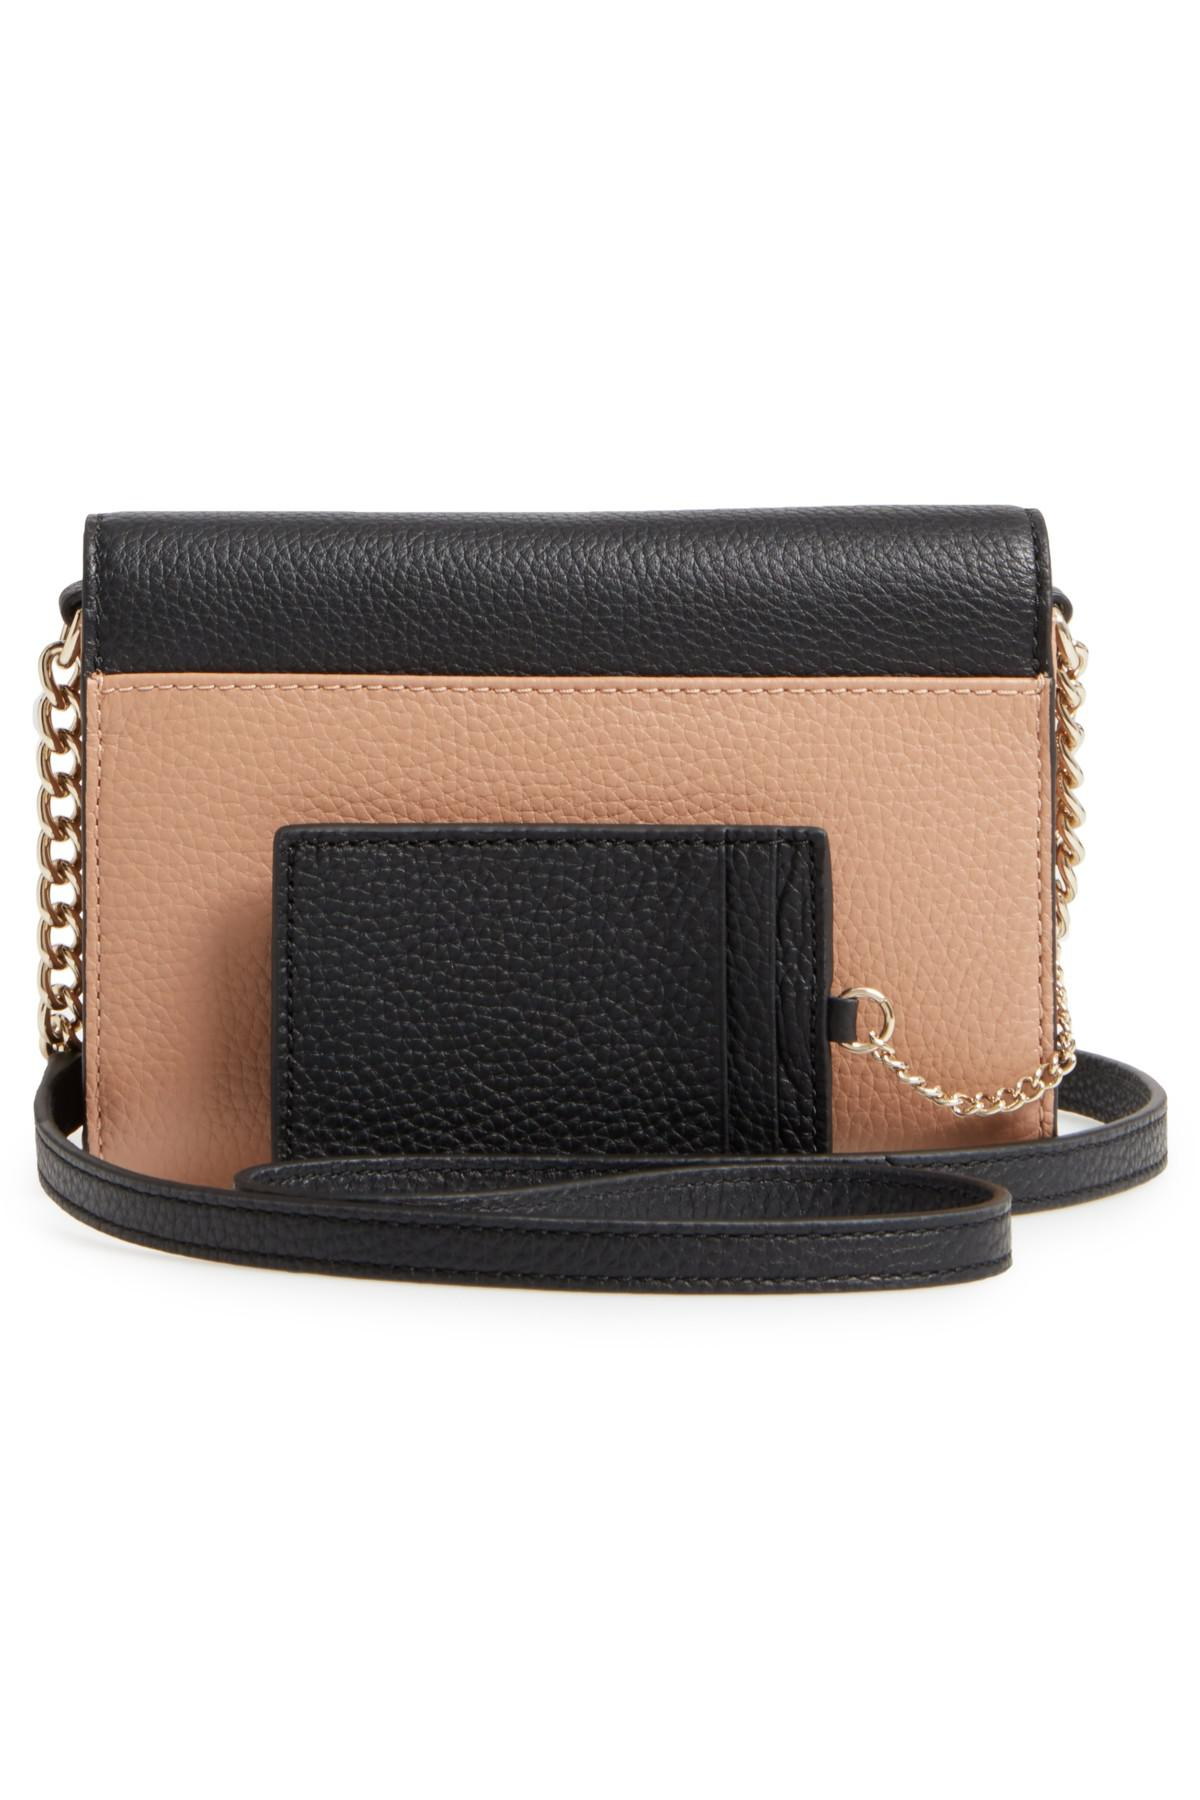 dc4dfd0f47d9 Lyst - Kate Spade Jackson Street - Iva Leather Crossbody Bag in Black